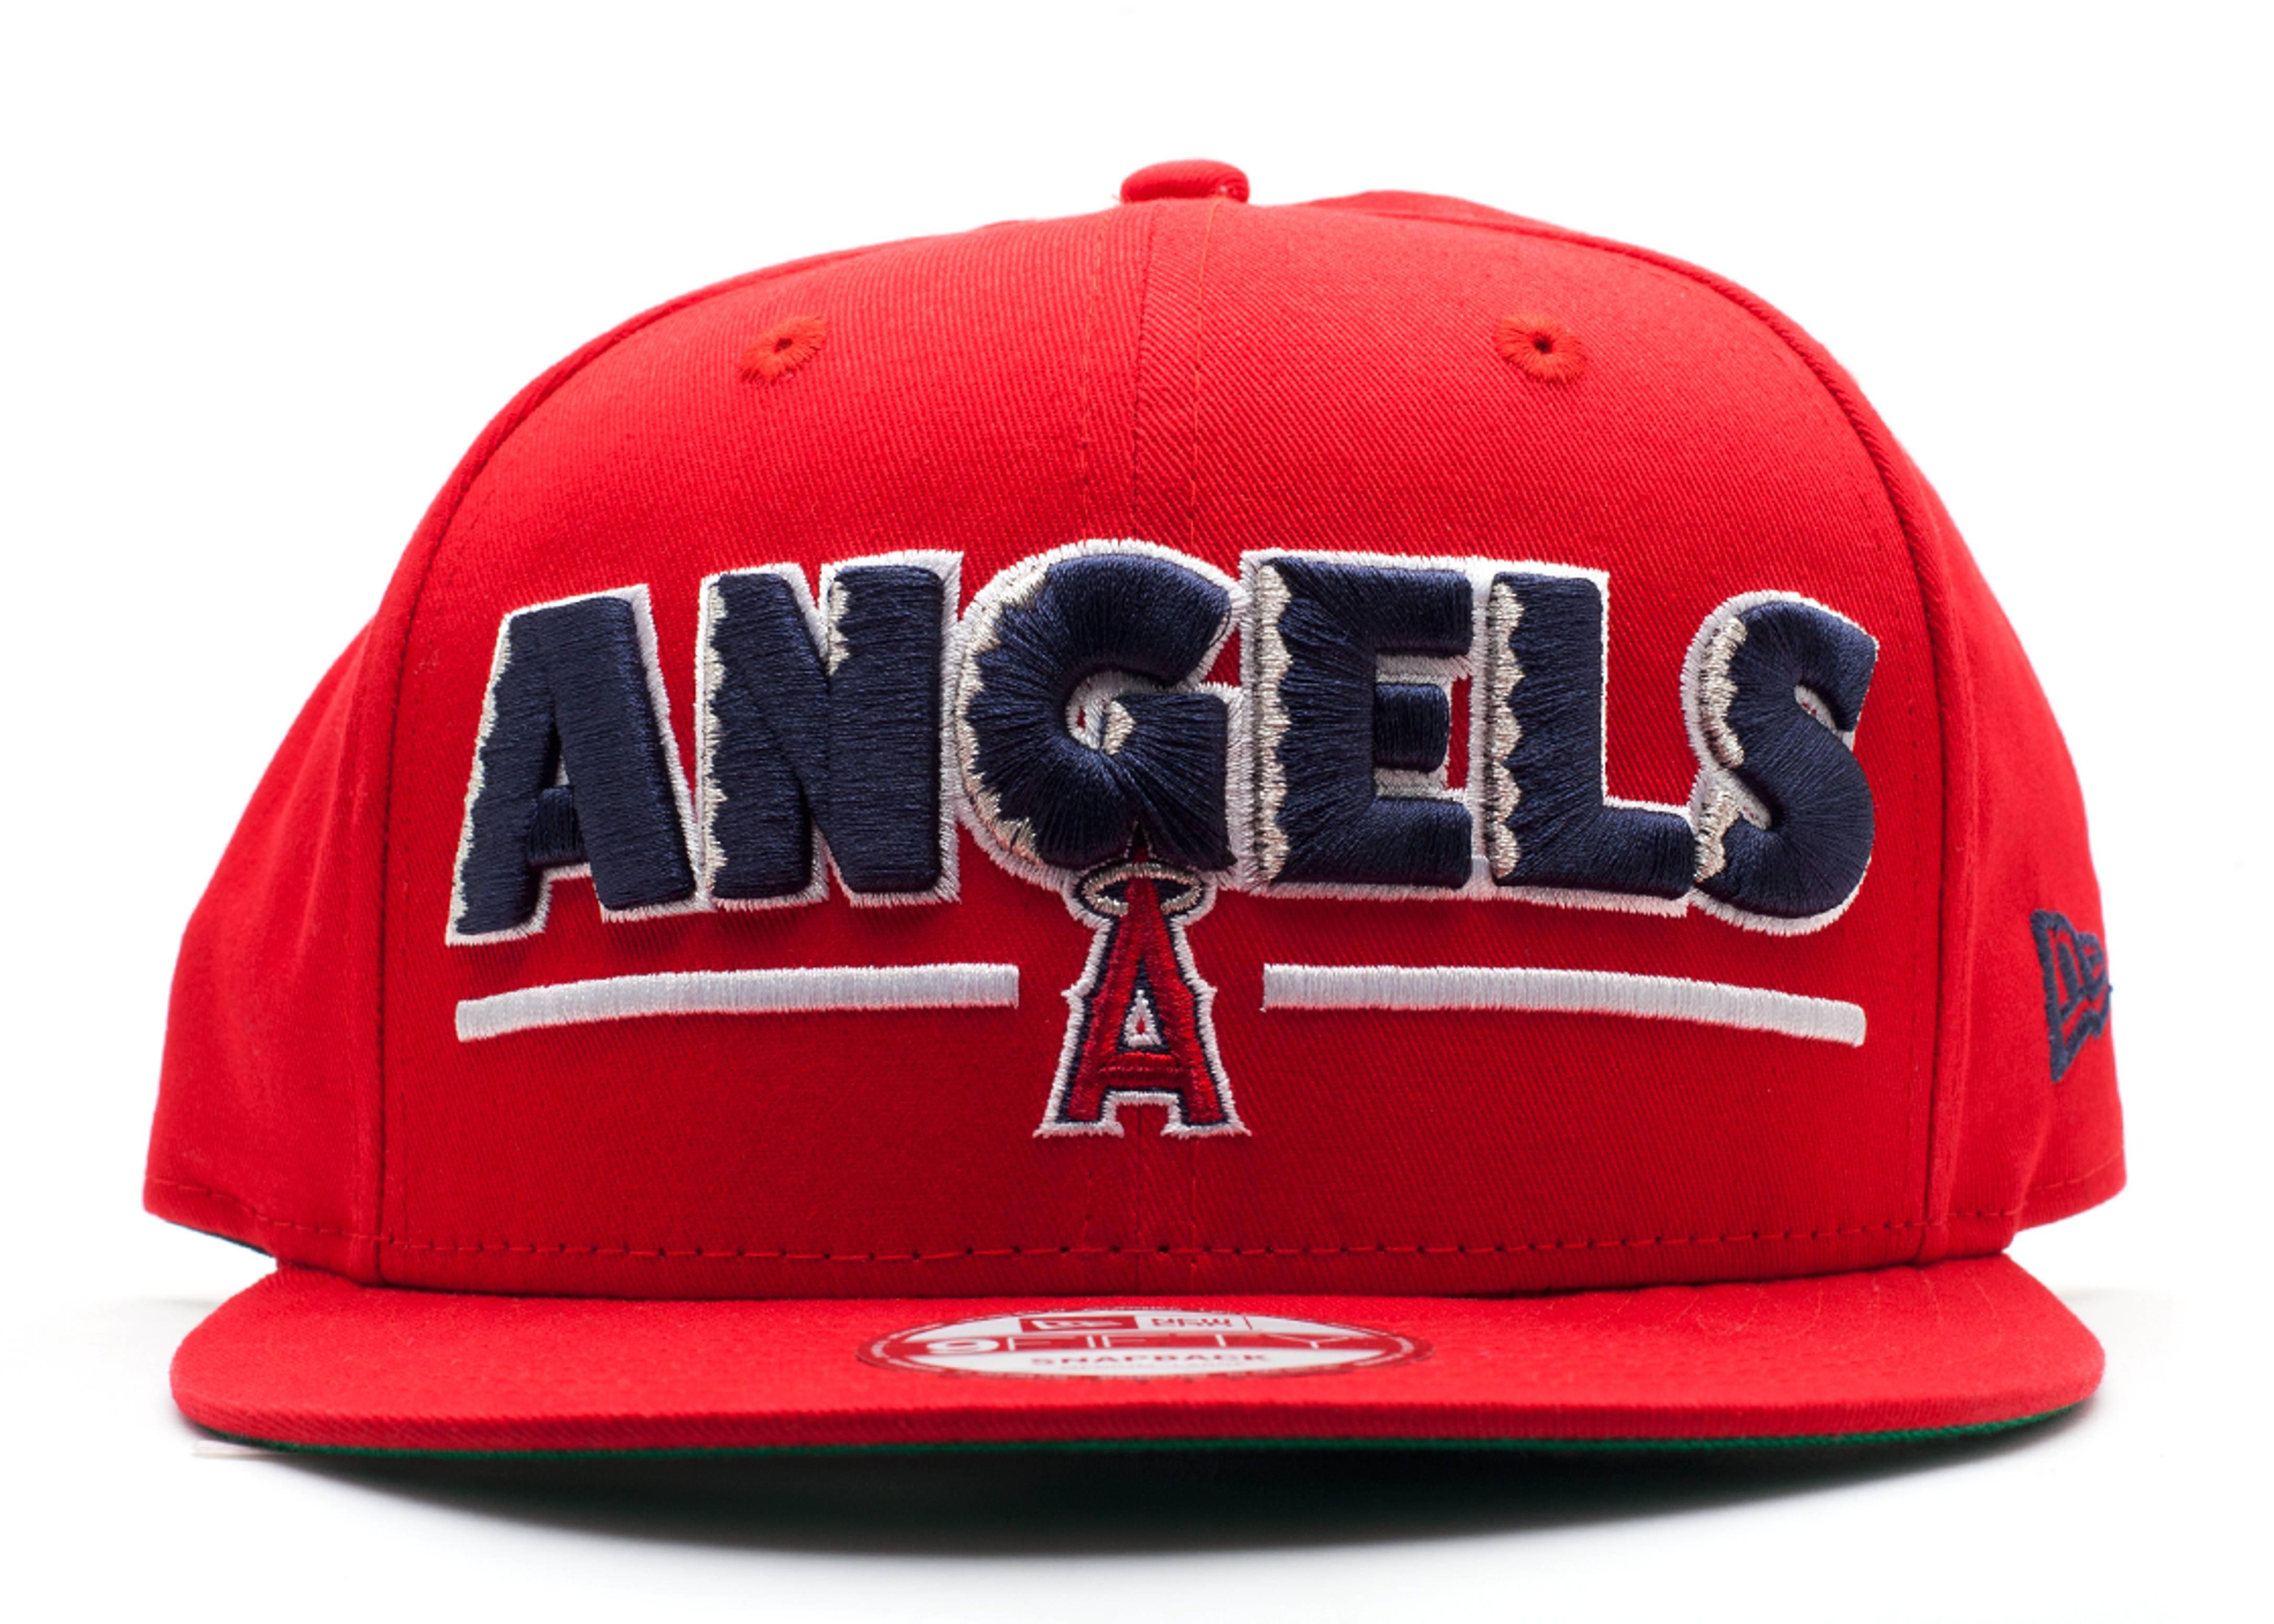 los angeles angels snap-back